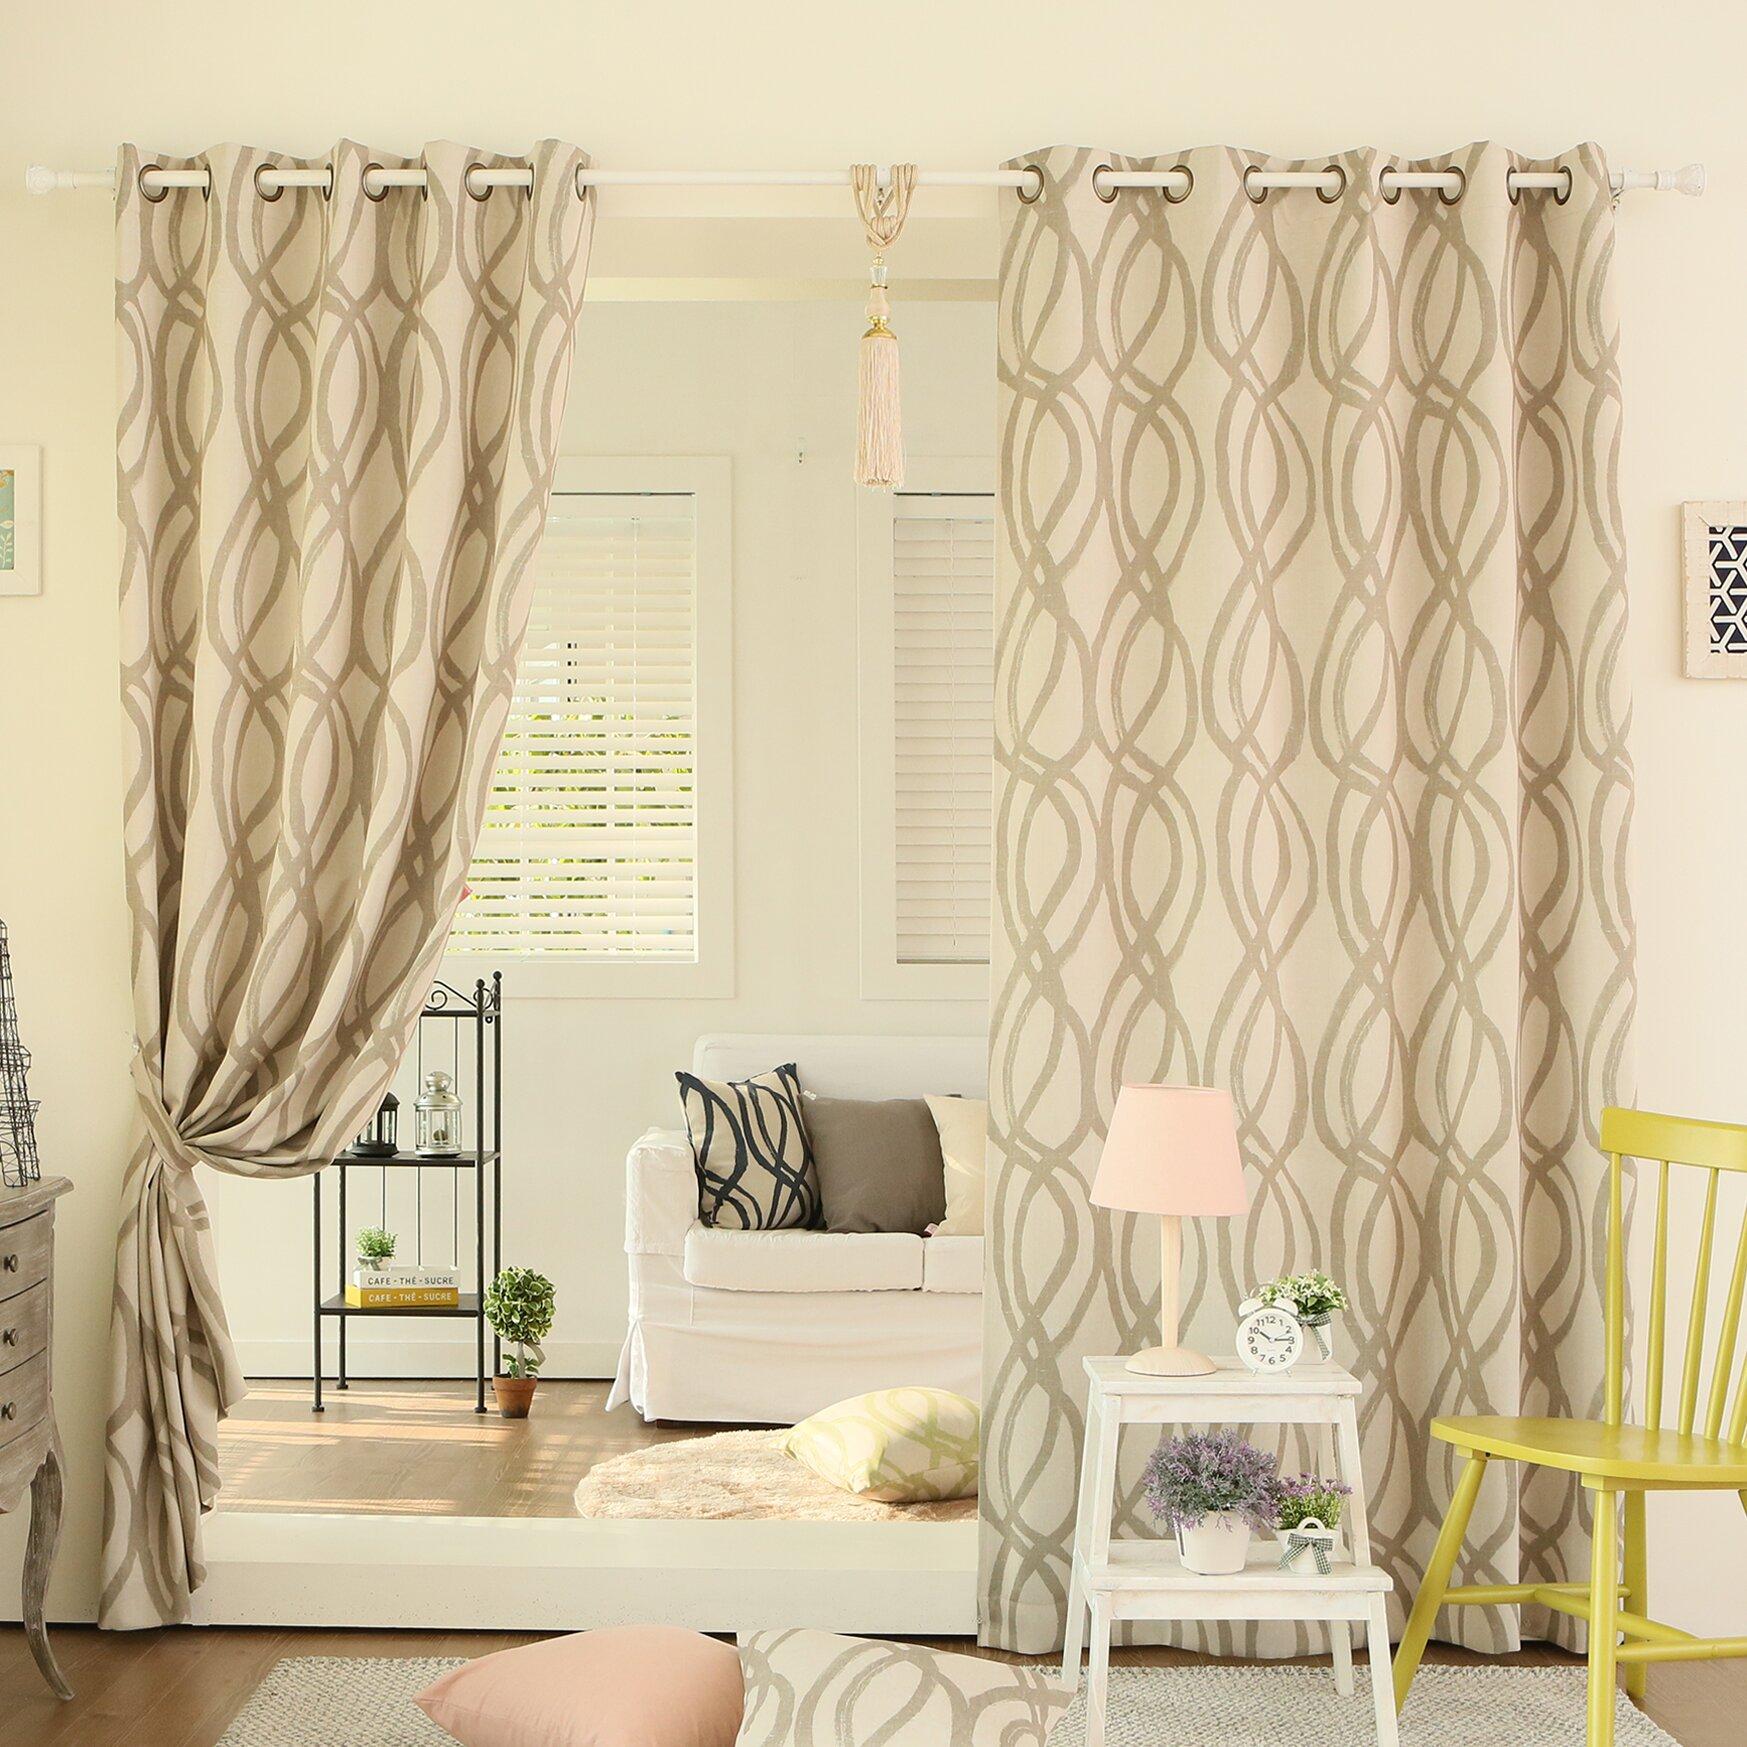 Wave Room Geometric Semi Sheer Grommet Curtain Panels Reviews Allmodern